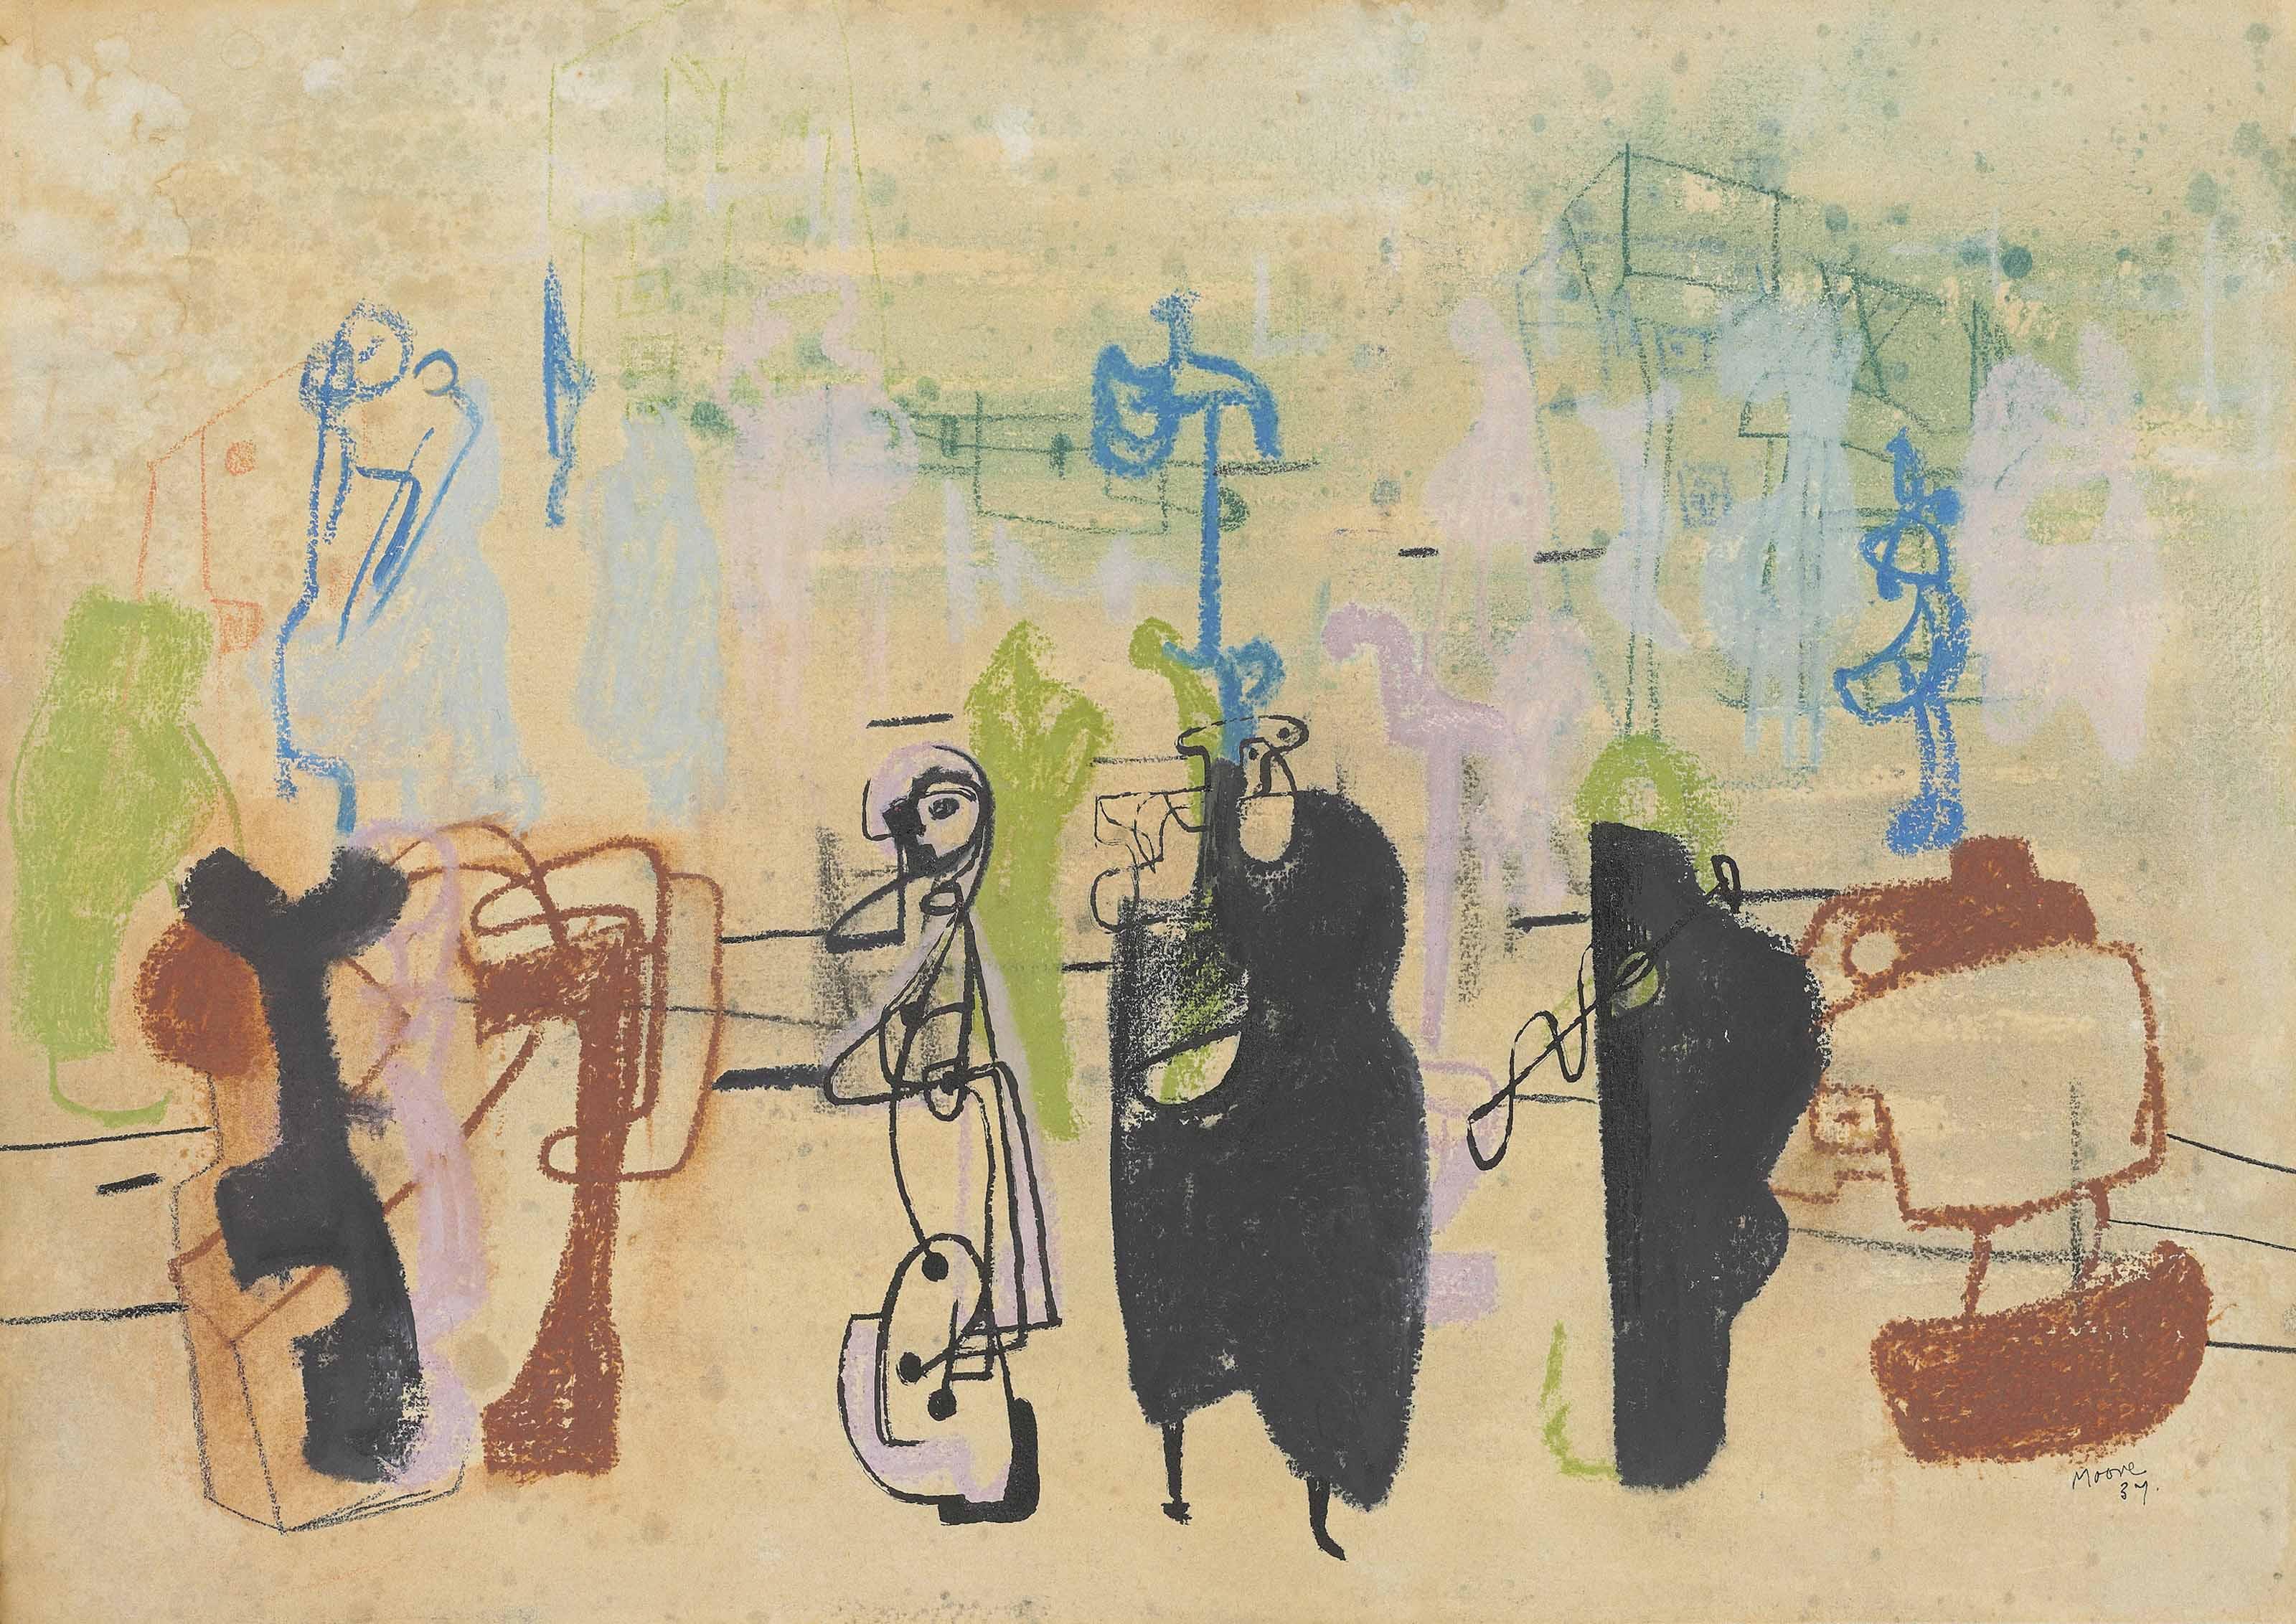 Henry Moore, O.M., C.H. (1898-